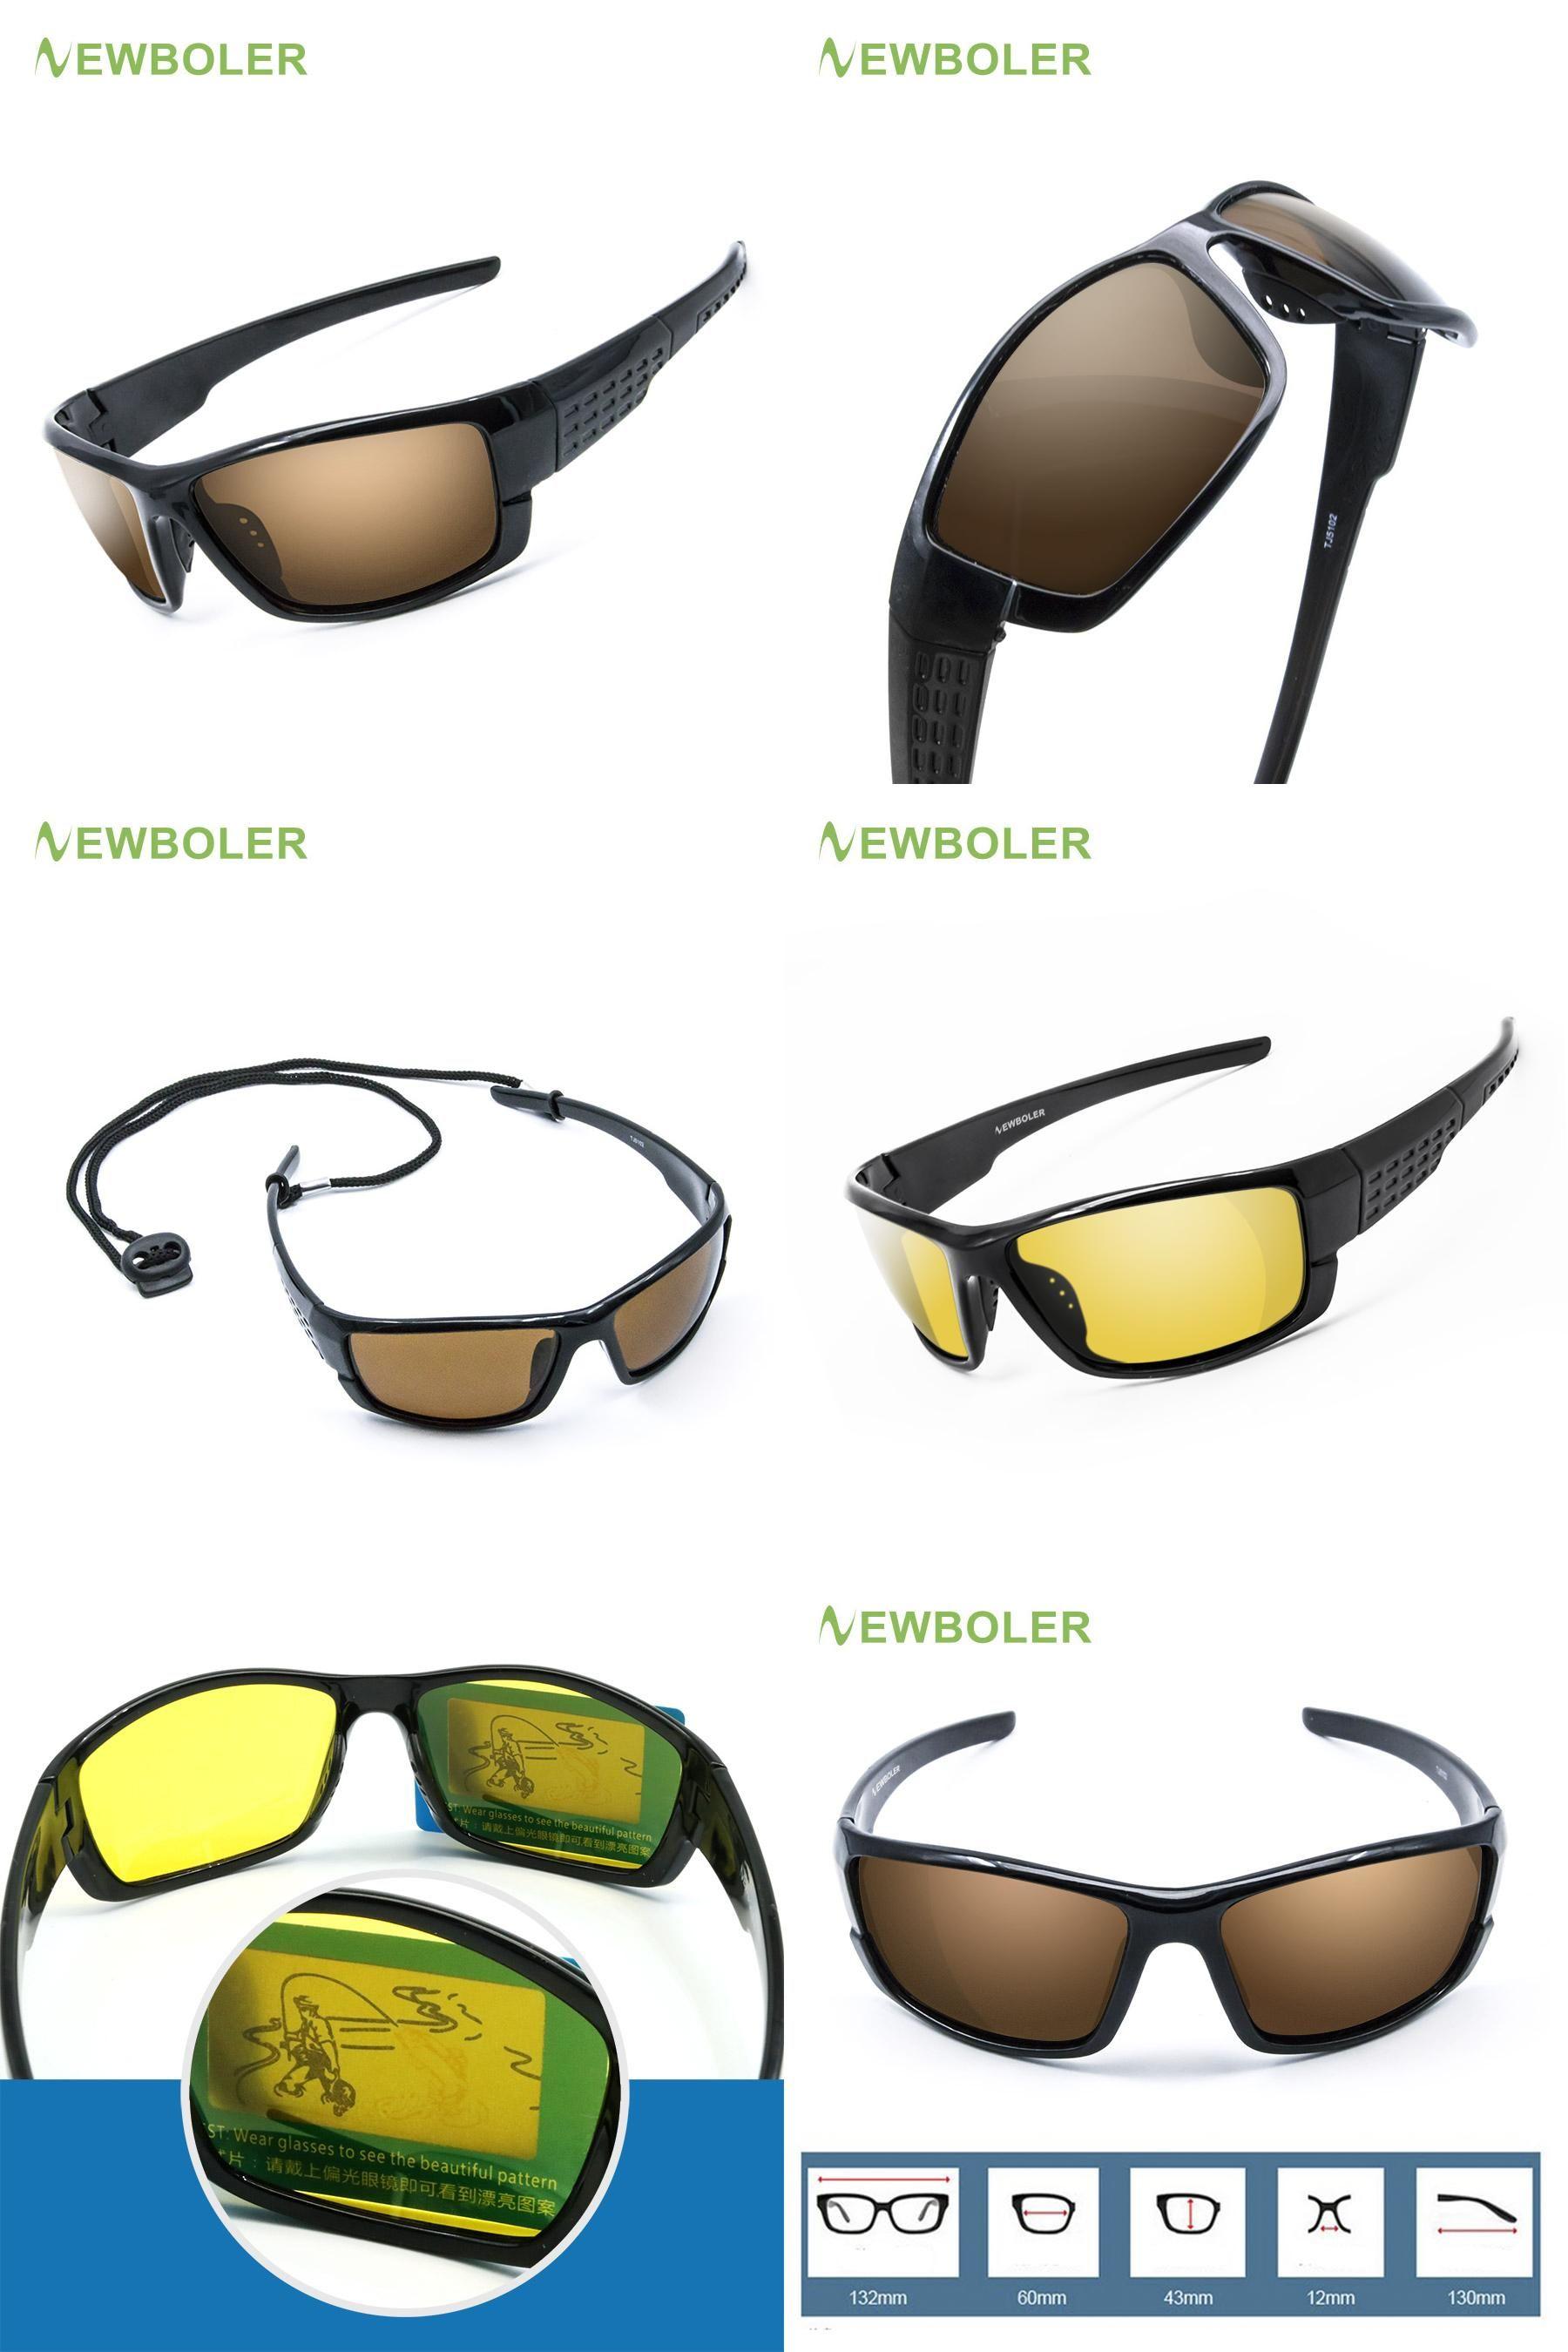 cb6d95f6551  Visit to Buy  NEWBOLER Polarized Fishing Sunglasses Brown Yellow Lenses  Night Version Men